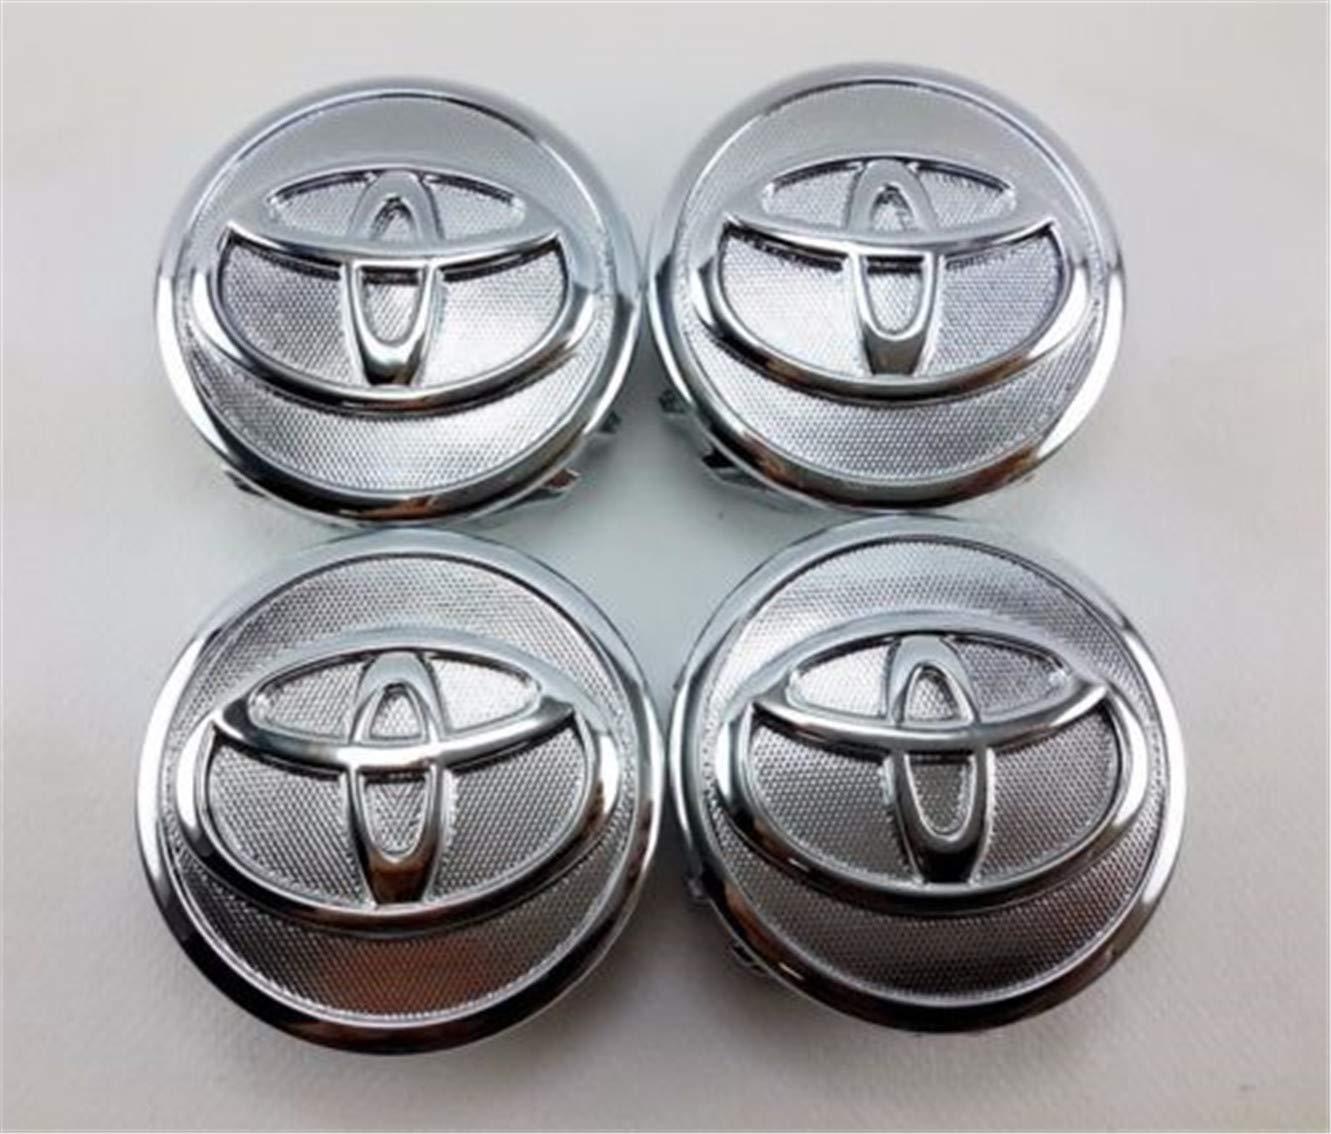 Jqlcgtmqwu 4 cappucci copriruota per centro ruota per Toyota 07-13 Prius 09-13 Corolla 07-14 Yaris